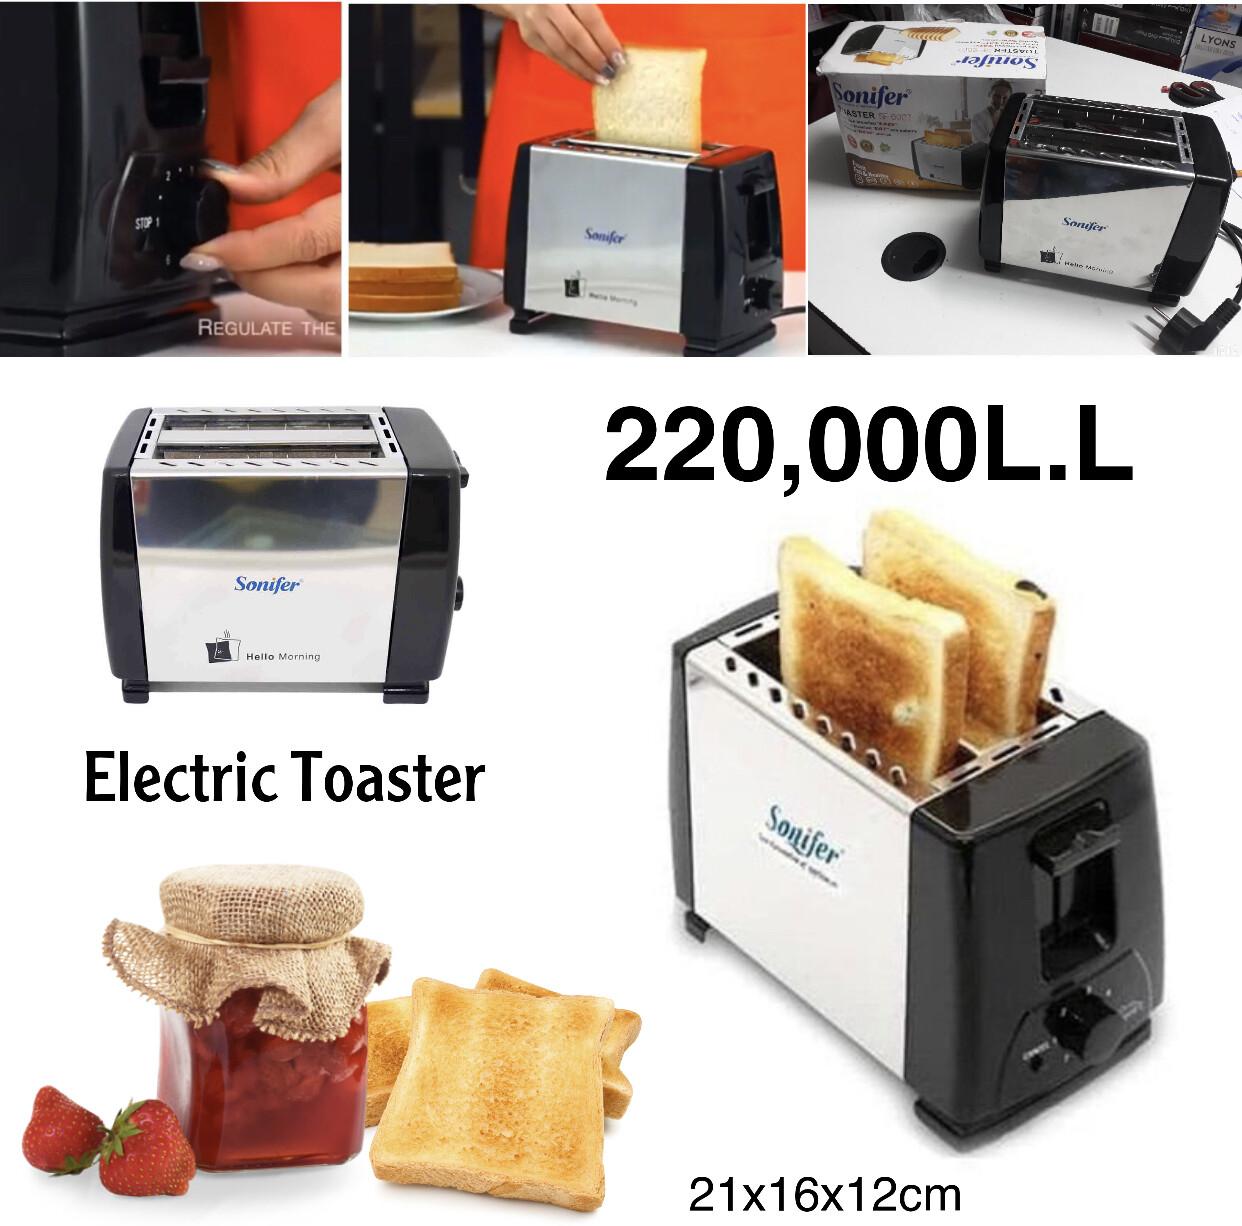 """Sonifer"" Toaster"